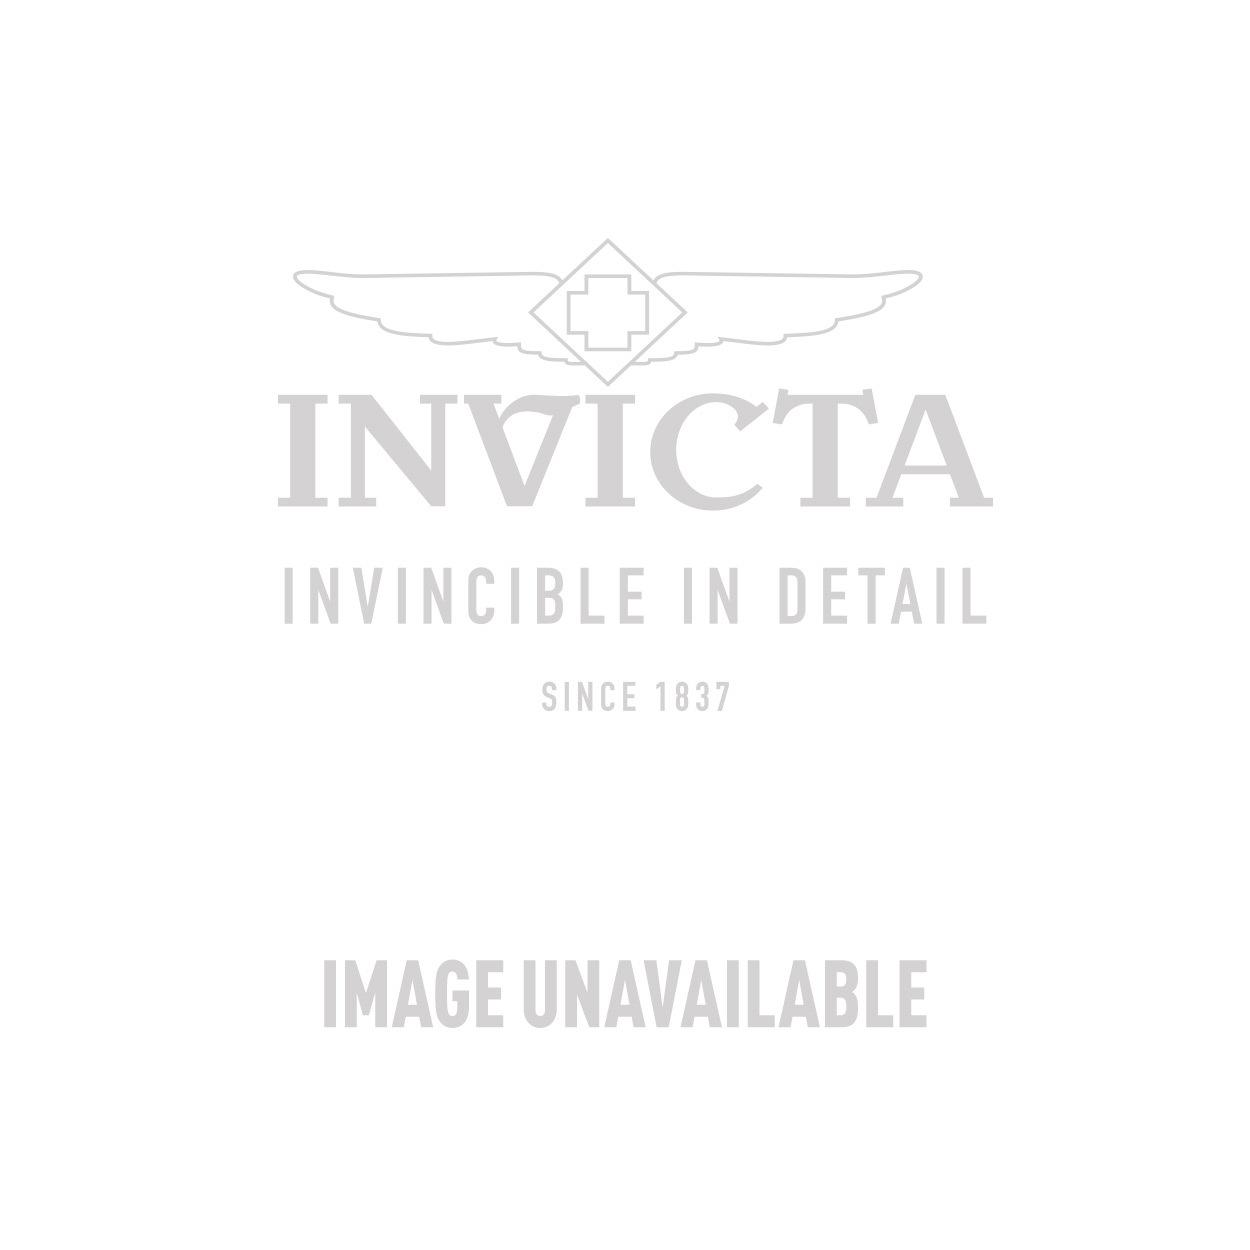 Invicta  Bolt Zeus  Quartz Watch - Gold, Gunmetal case with Gold, Gunmetal tone Stainless Steel band - Model 12741